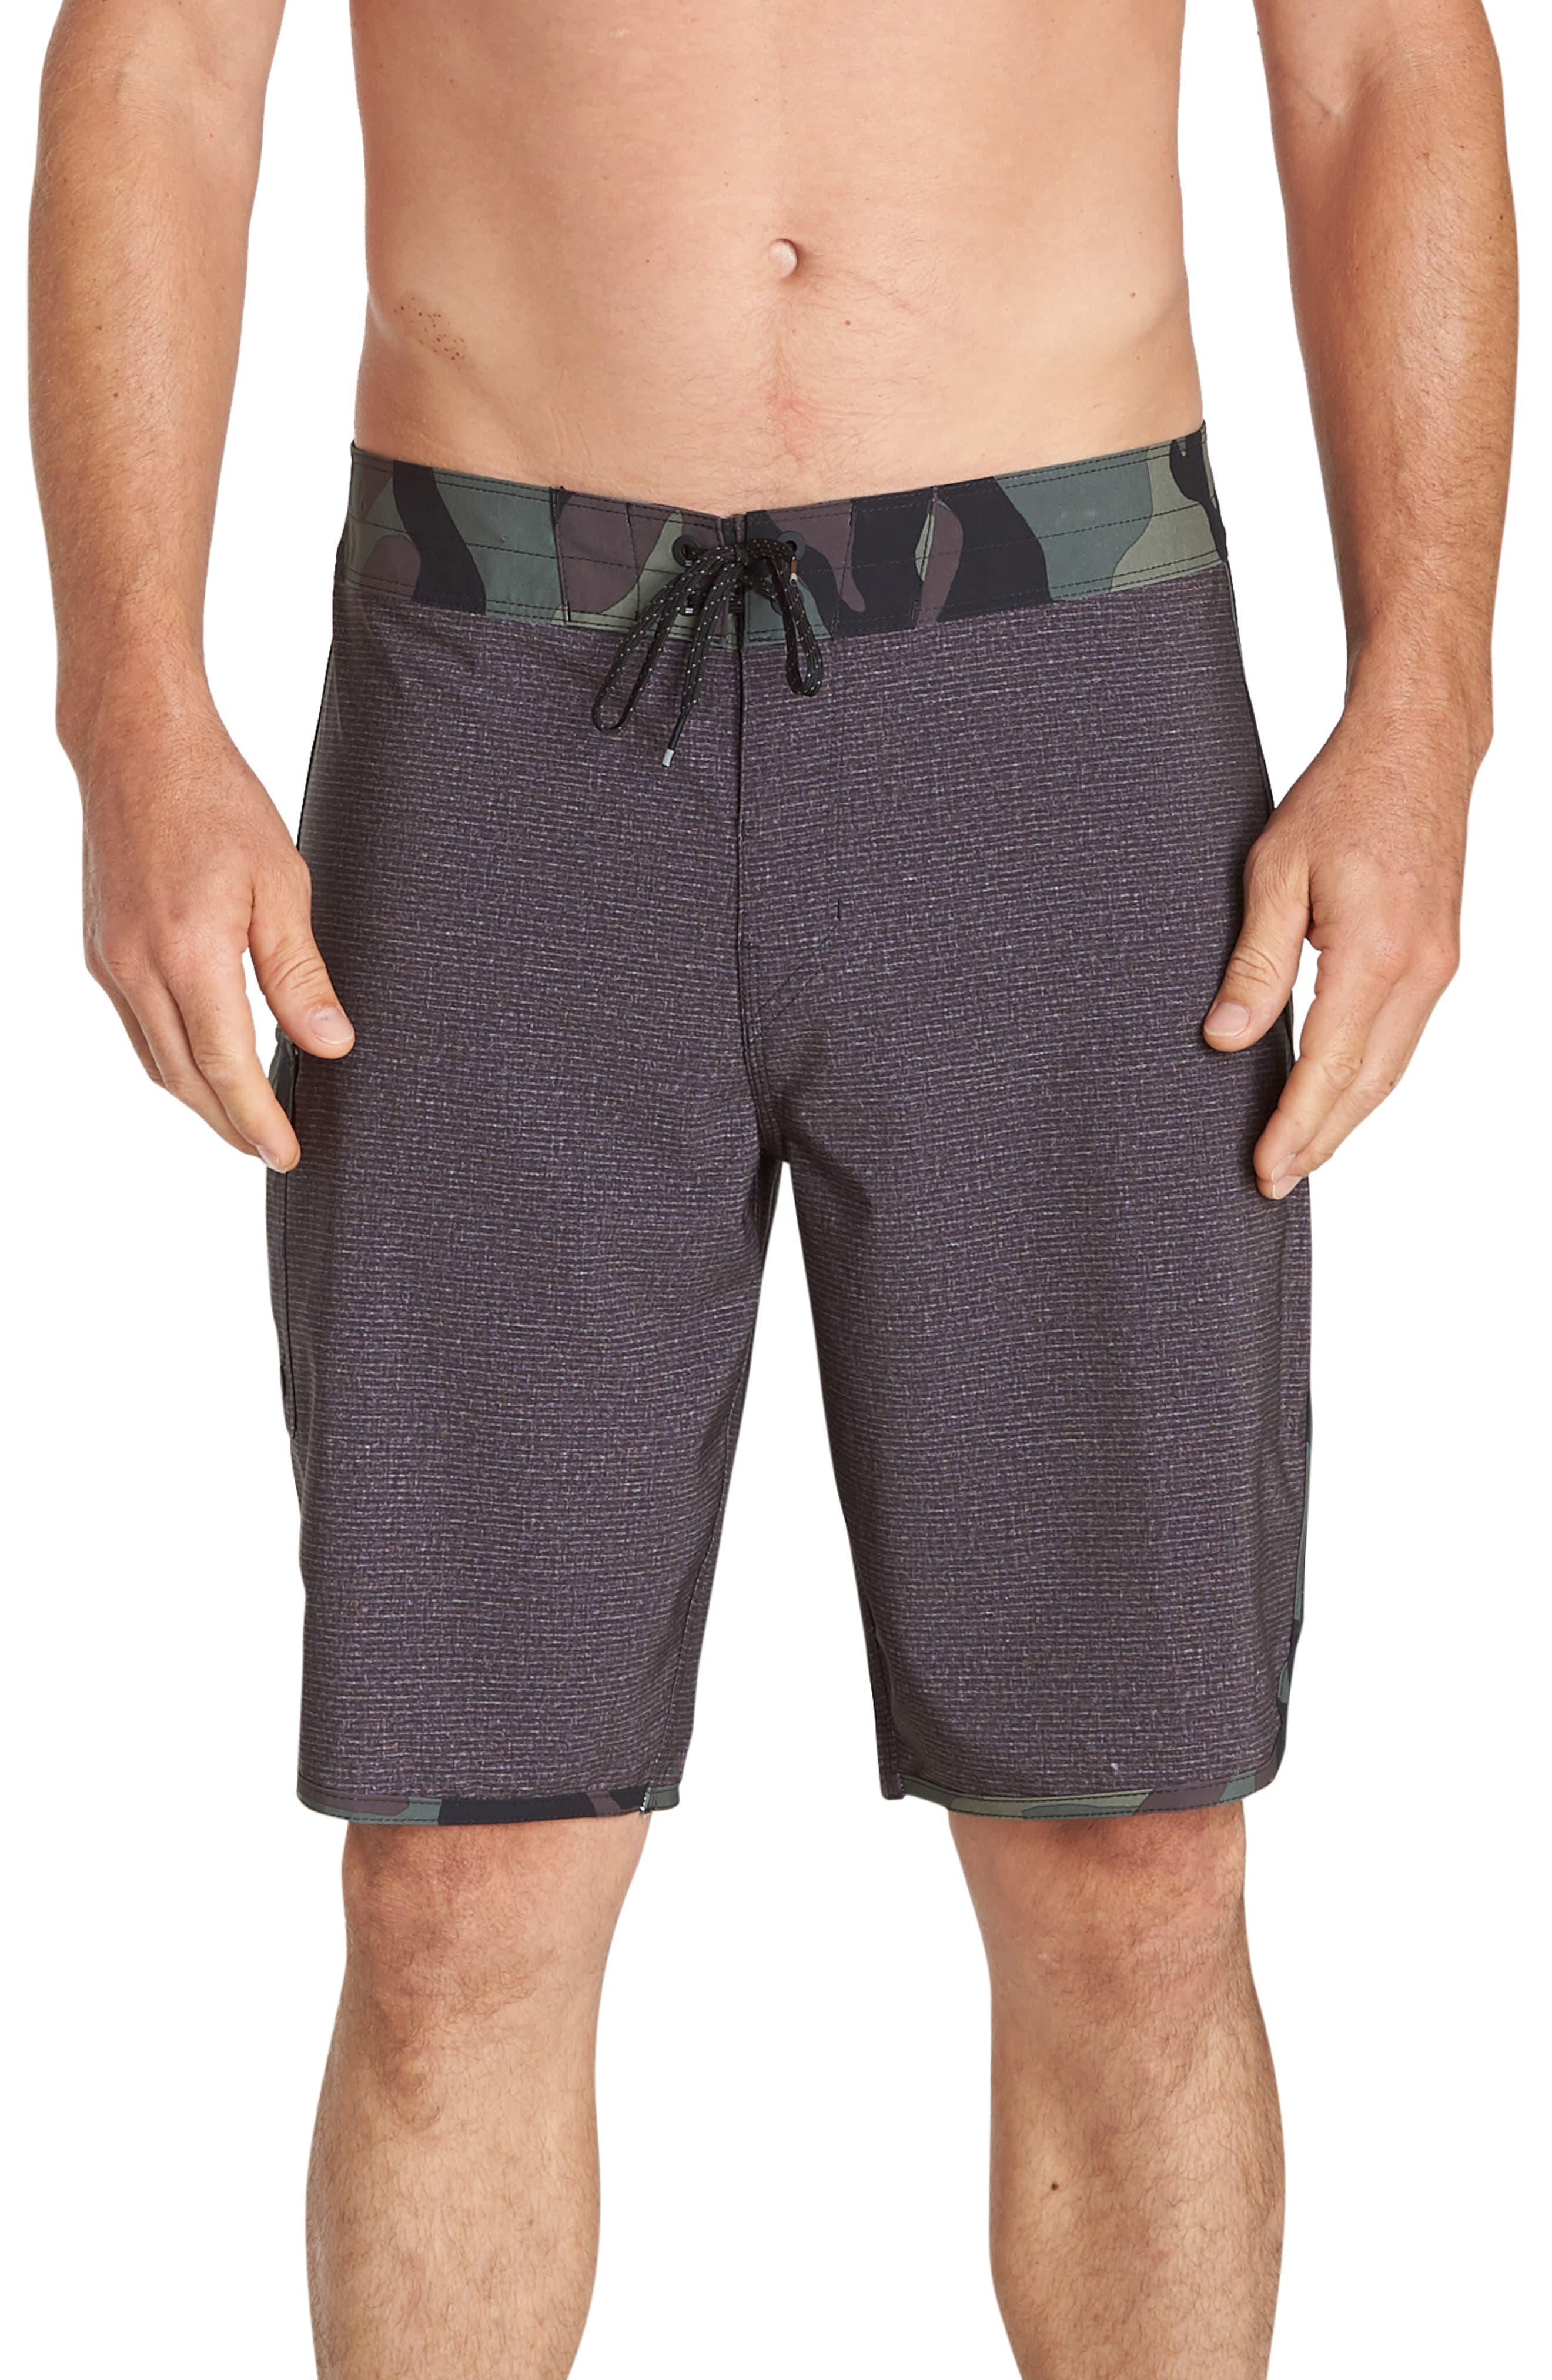 Billabong 73 Pro Board Shorts, Black